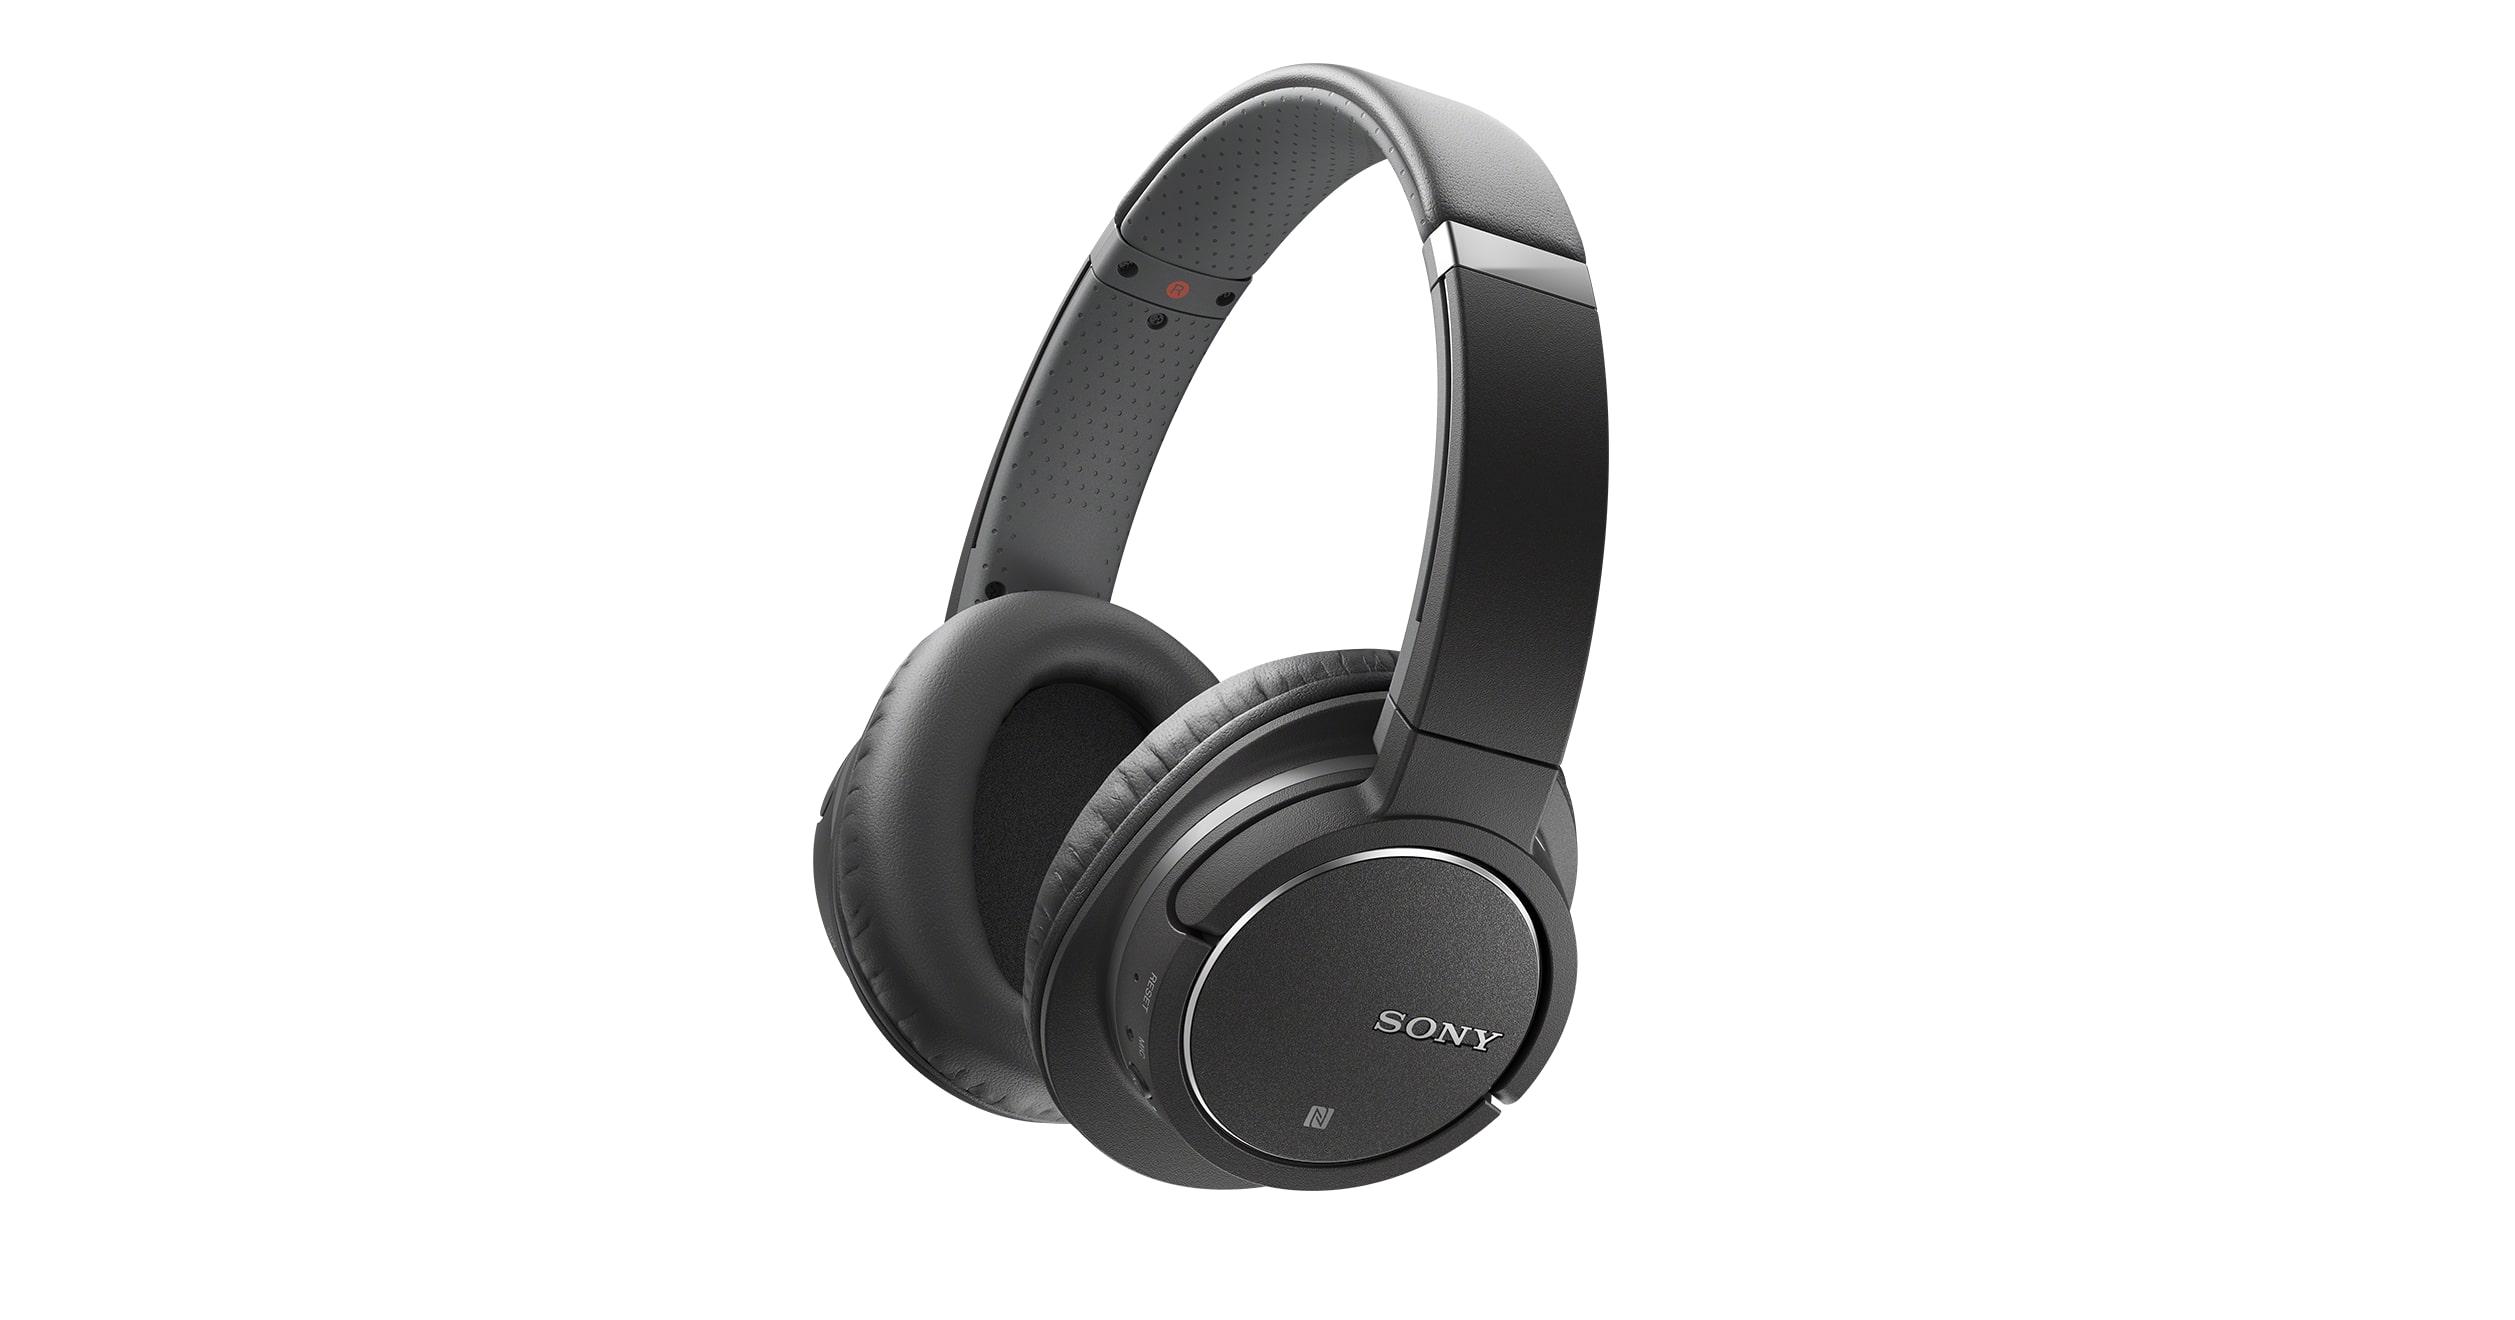 wireless noise cancelling headphones mdr zx770bn sony de. Black Bedroom Furniture Sets. Home Design Ideas